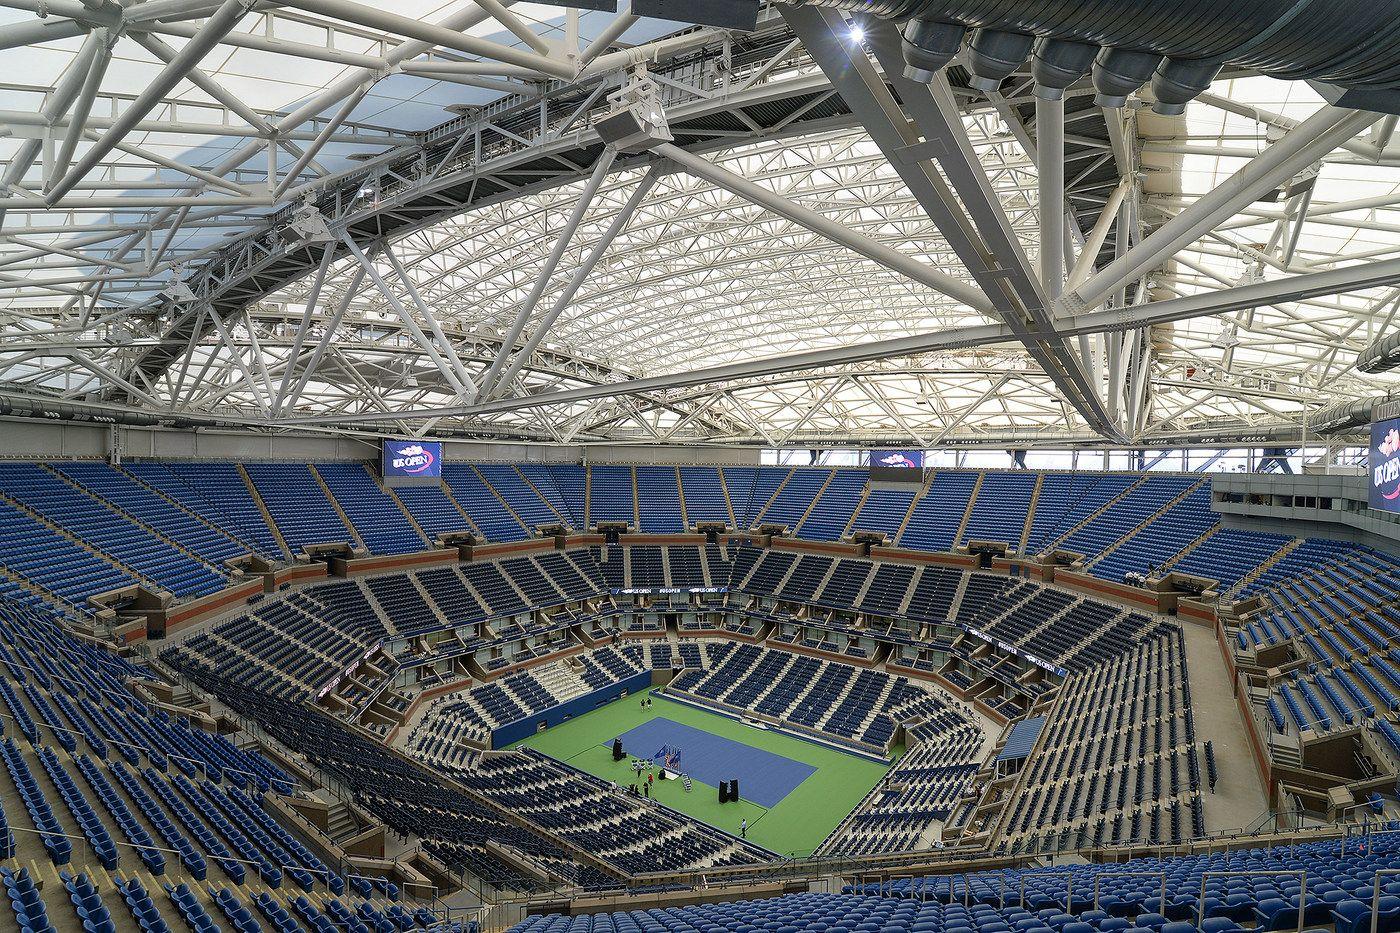 Photos Unveiling Spectacular Arthur Ashe Stadium Roof Arthur Ashe Tennis Championships Travel